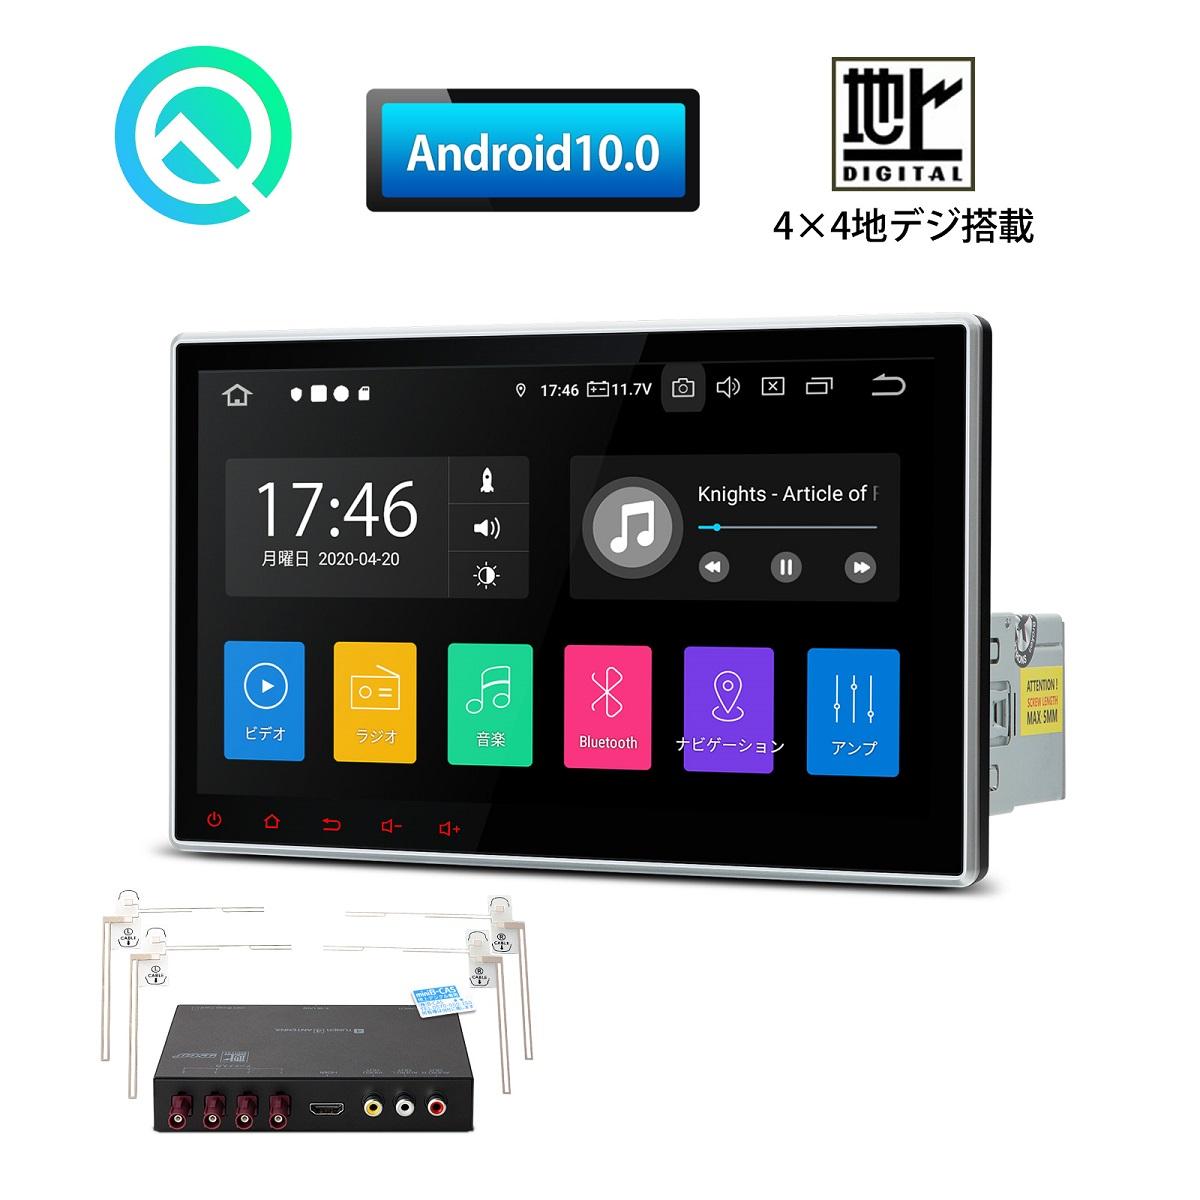 (DA100SIL) XTRONS Android 9.0 フルセグ 地デジ搭載 アプリ連動操作可 10インチ 大画面 1DIN 車載PC RAM2G カーナビ マルチウィンドウ OBD2 DVR